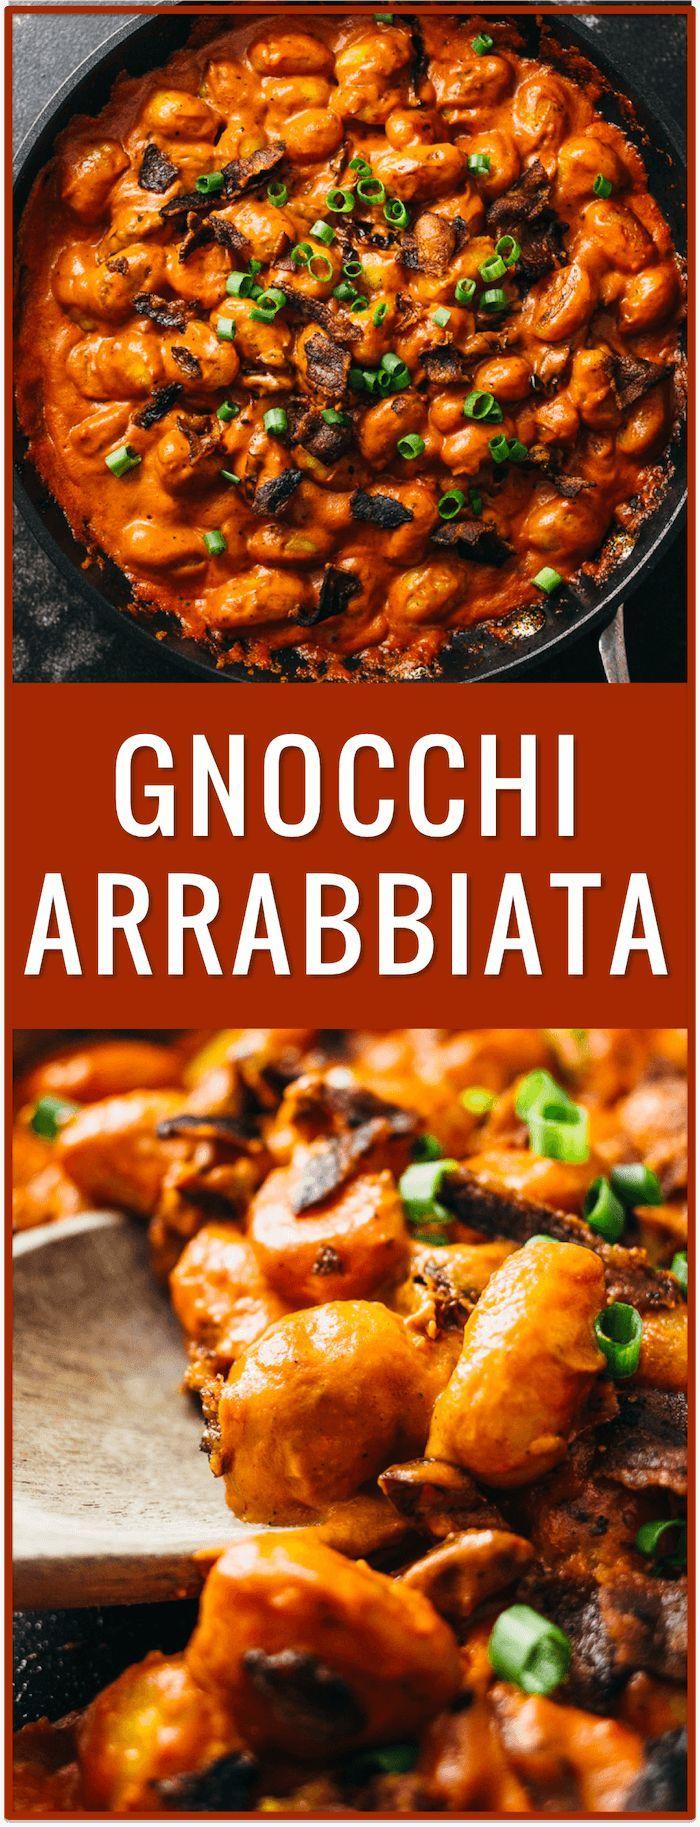 gnocchi arrabbiata, arrabiatta, bacon, tomatoes, pasta, dinner, recipe, easy, spicy, pomodoro, pasta sauce, creamy thick sauce, italian via /savory_tooth/